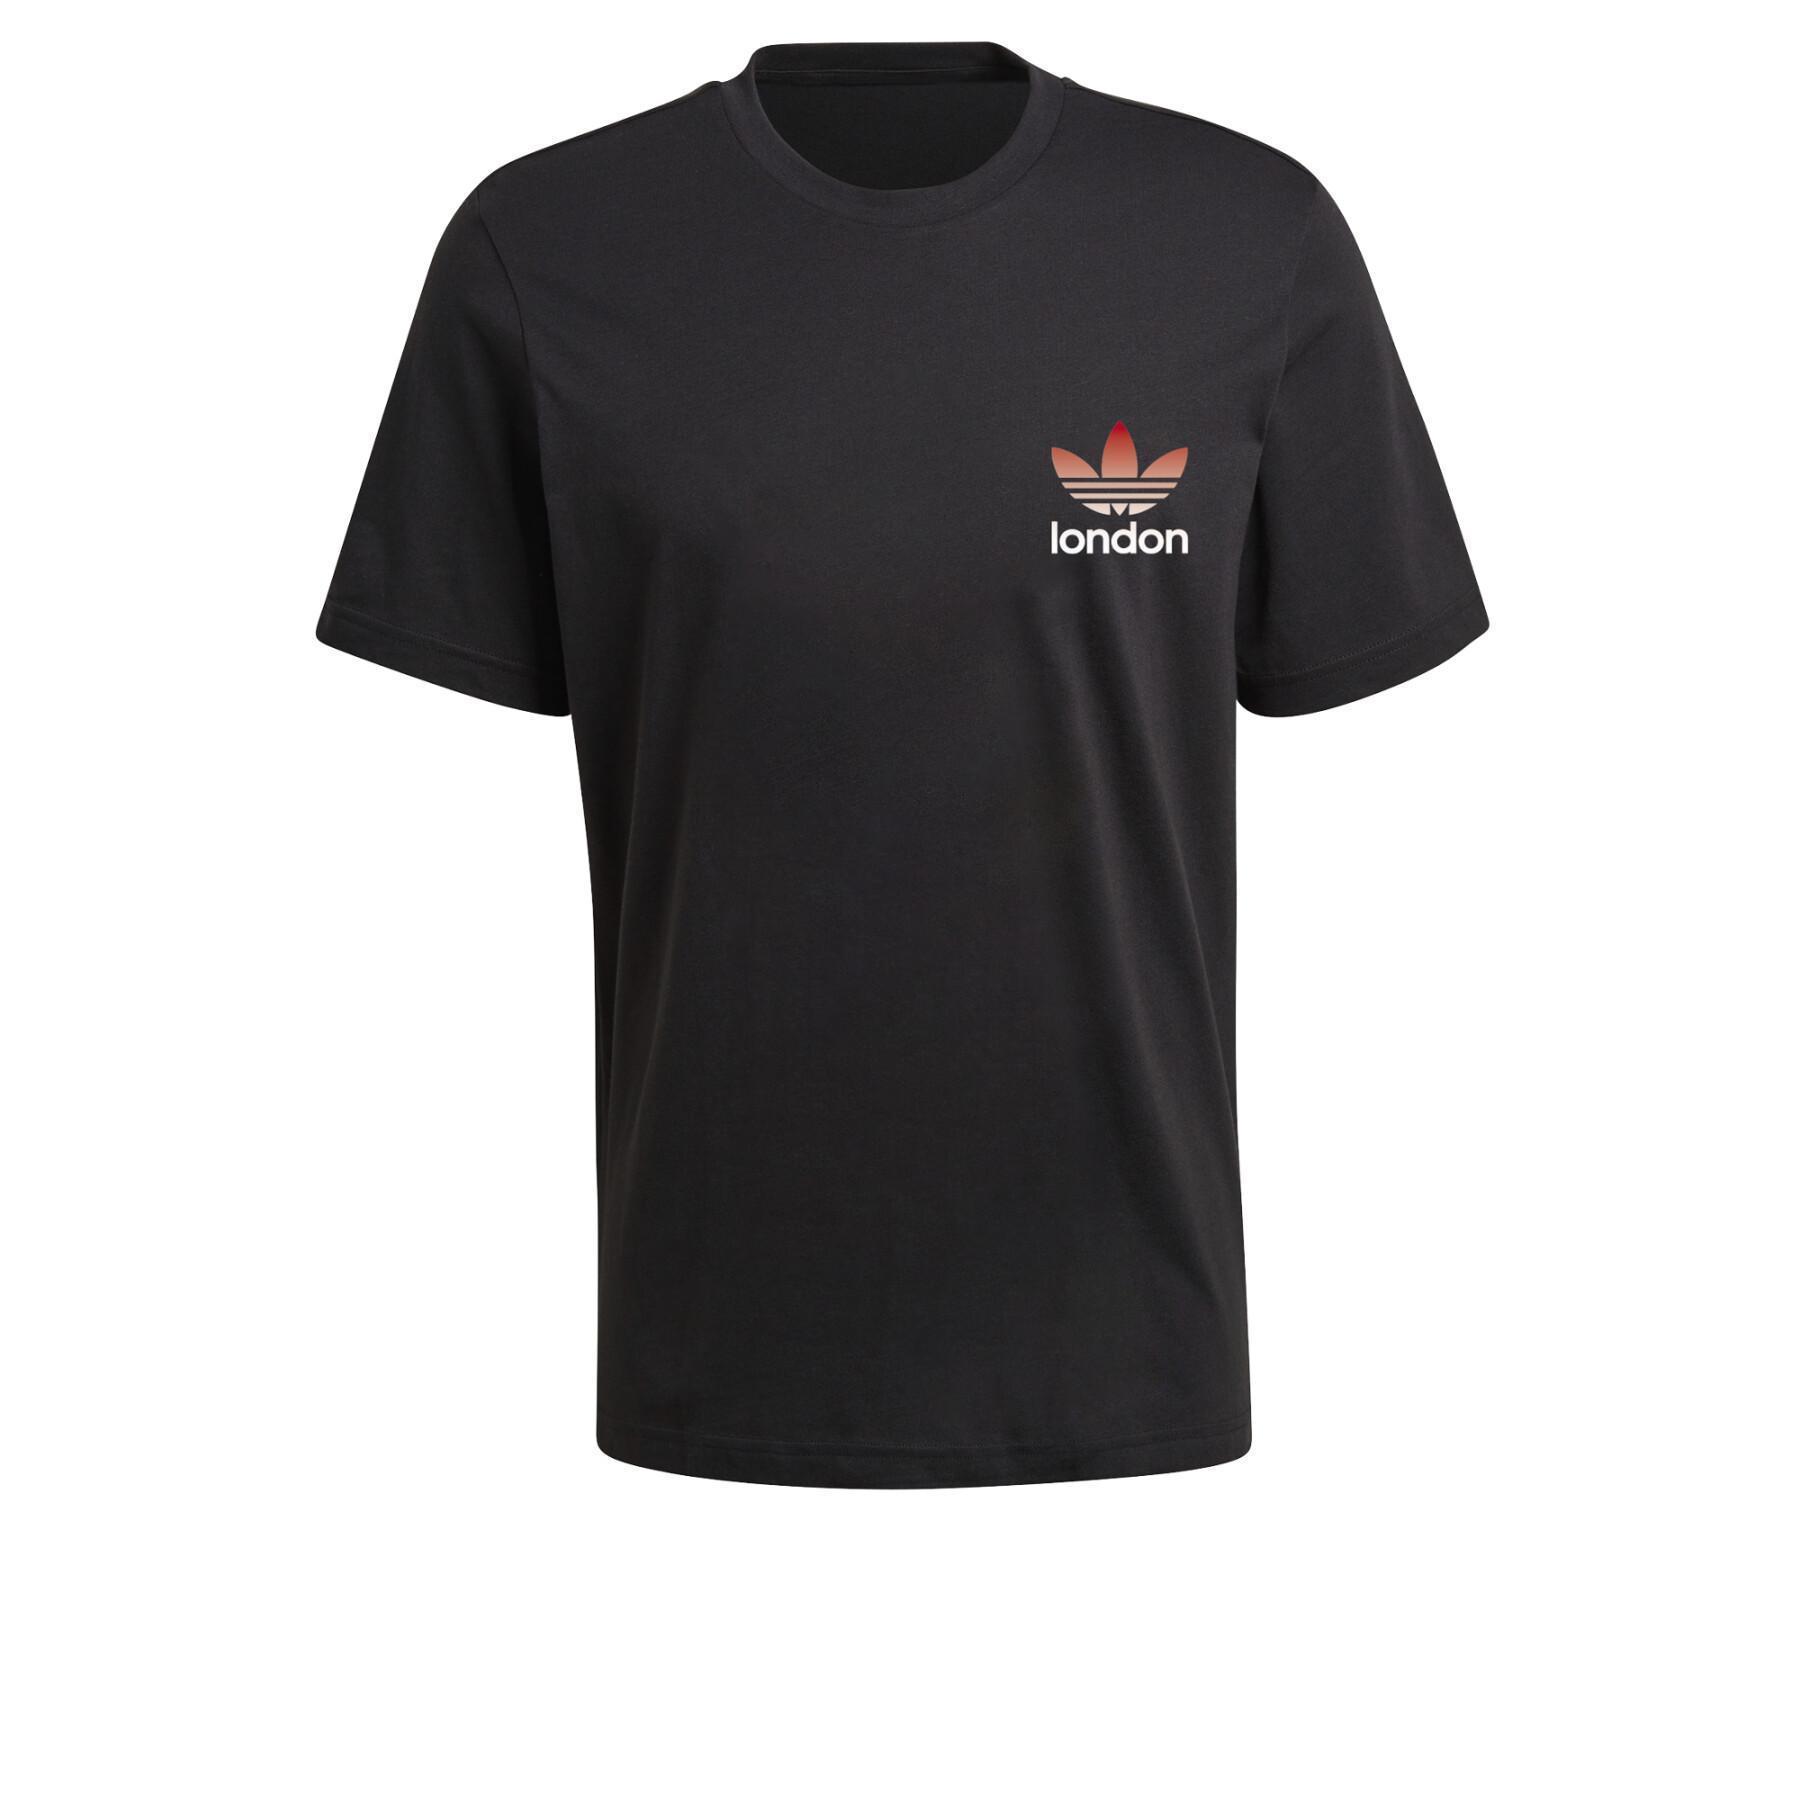 T-shirt adidas Originals London Trefoil 2